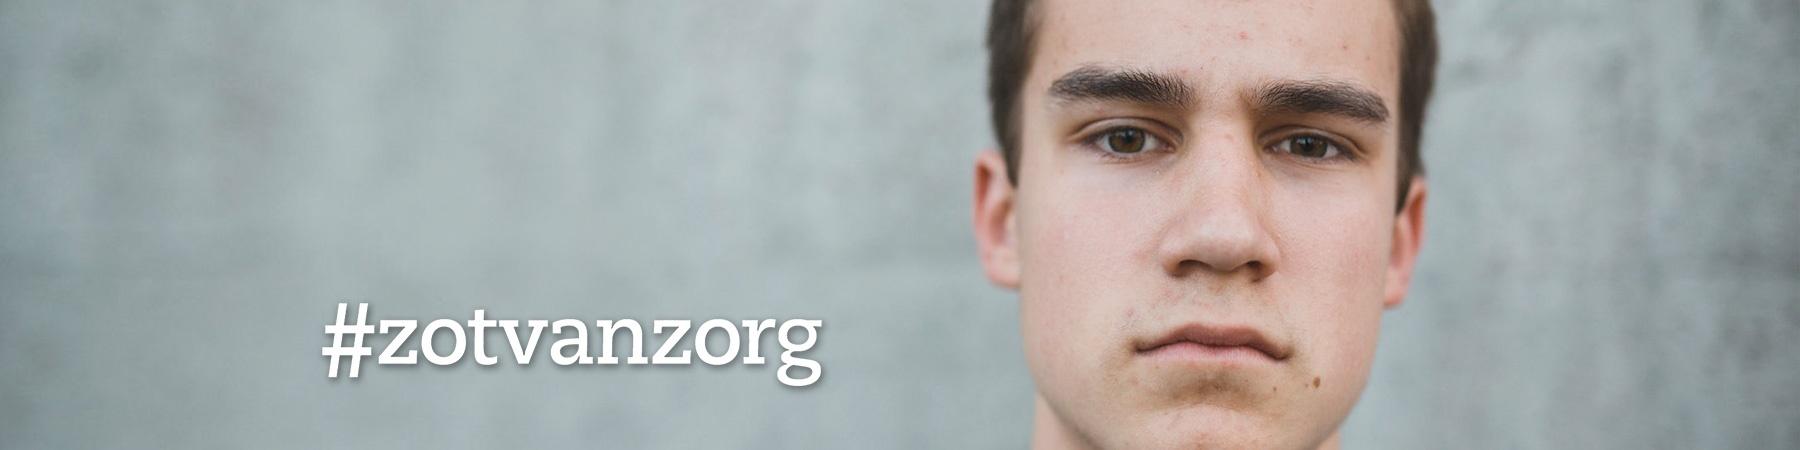 zotvanzorg_website_3_10.jpg